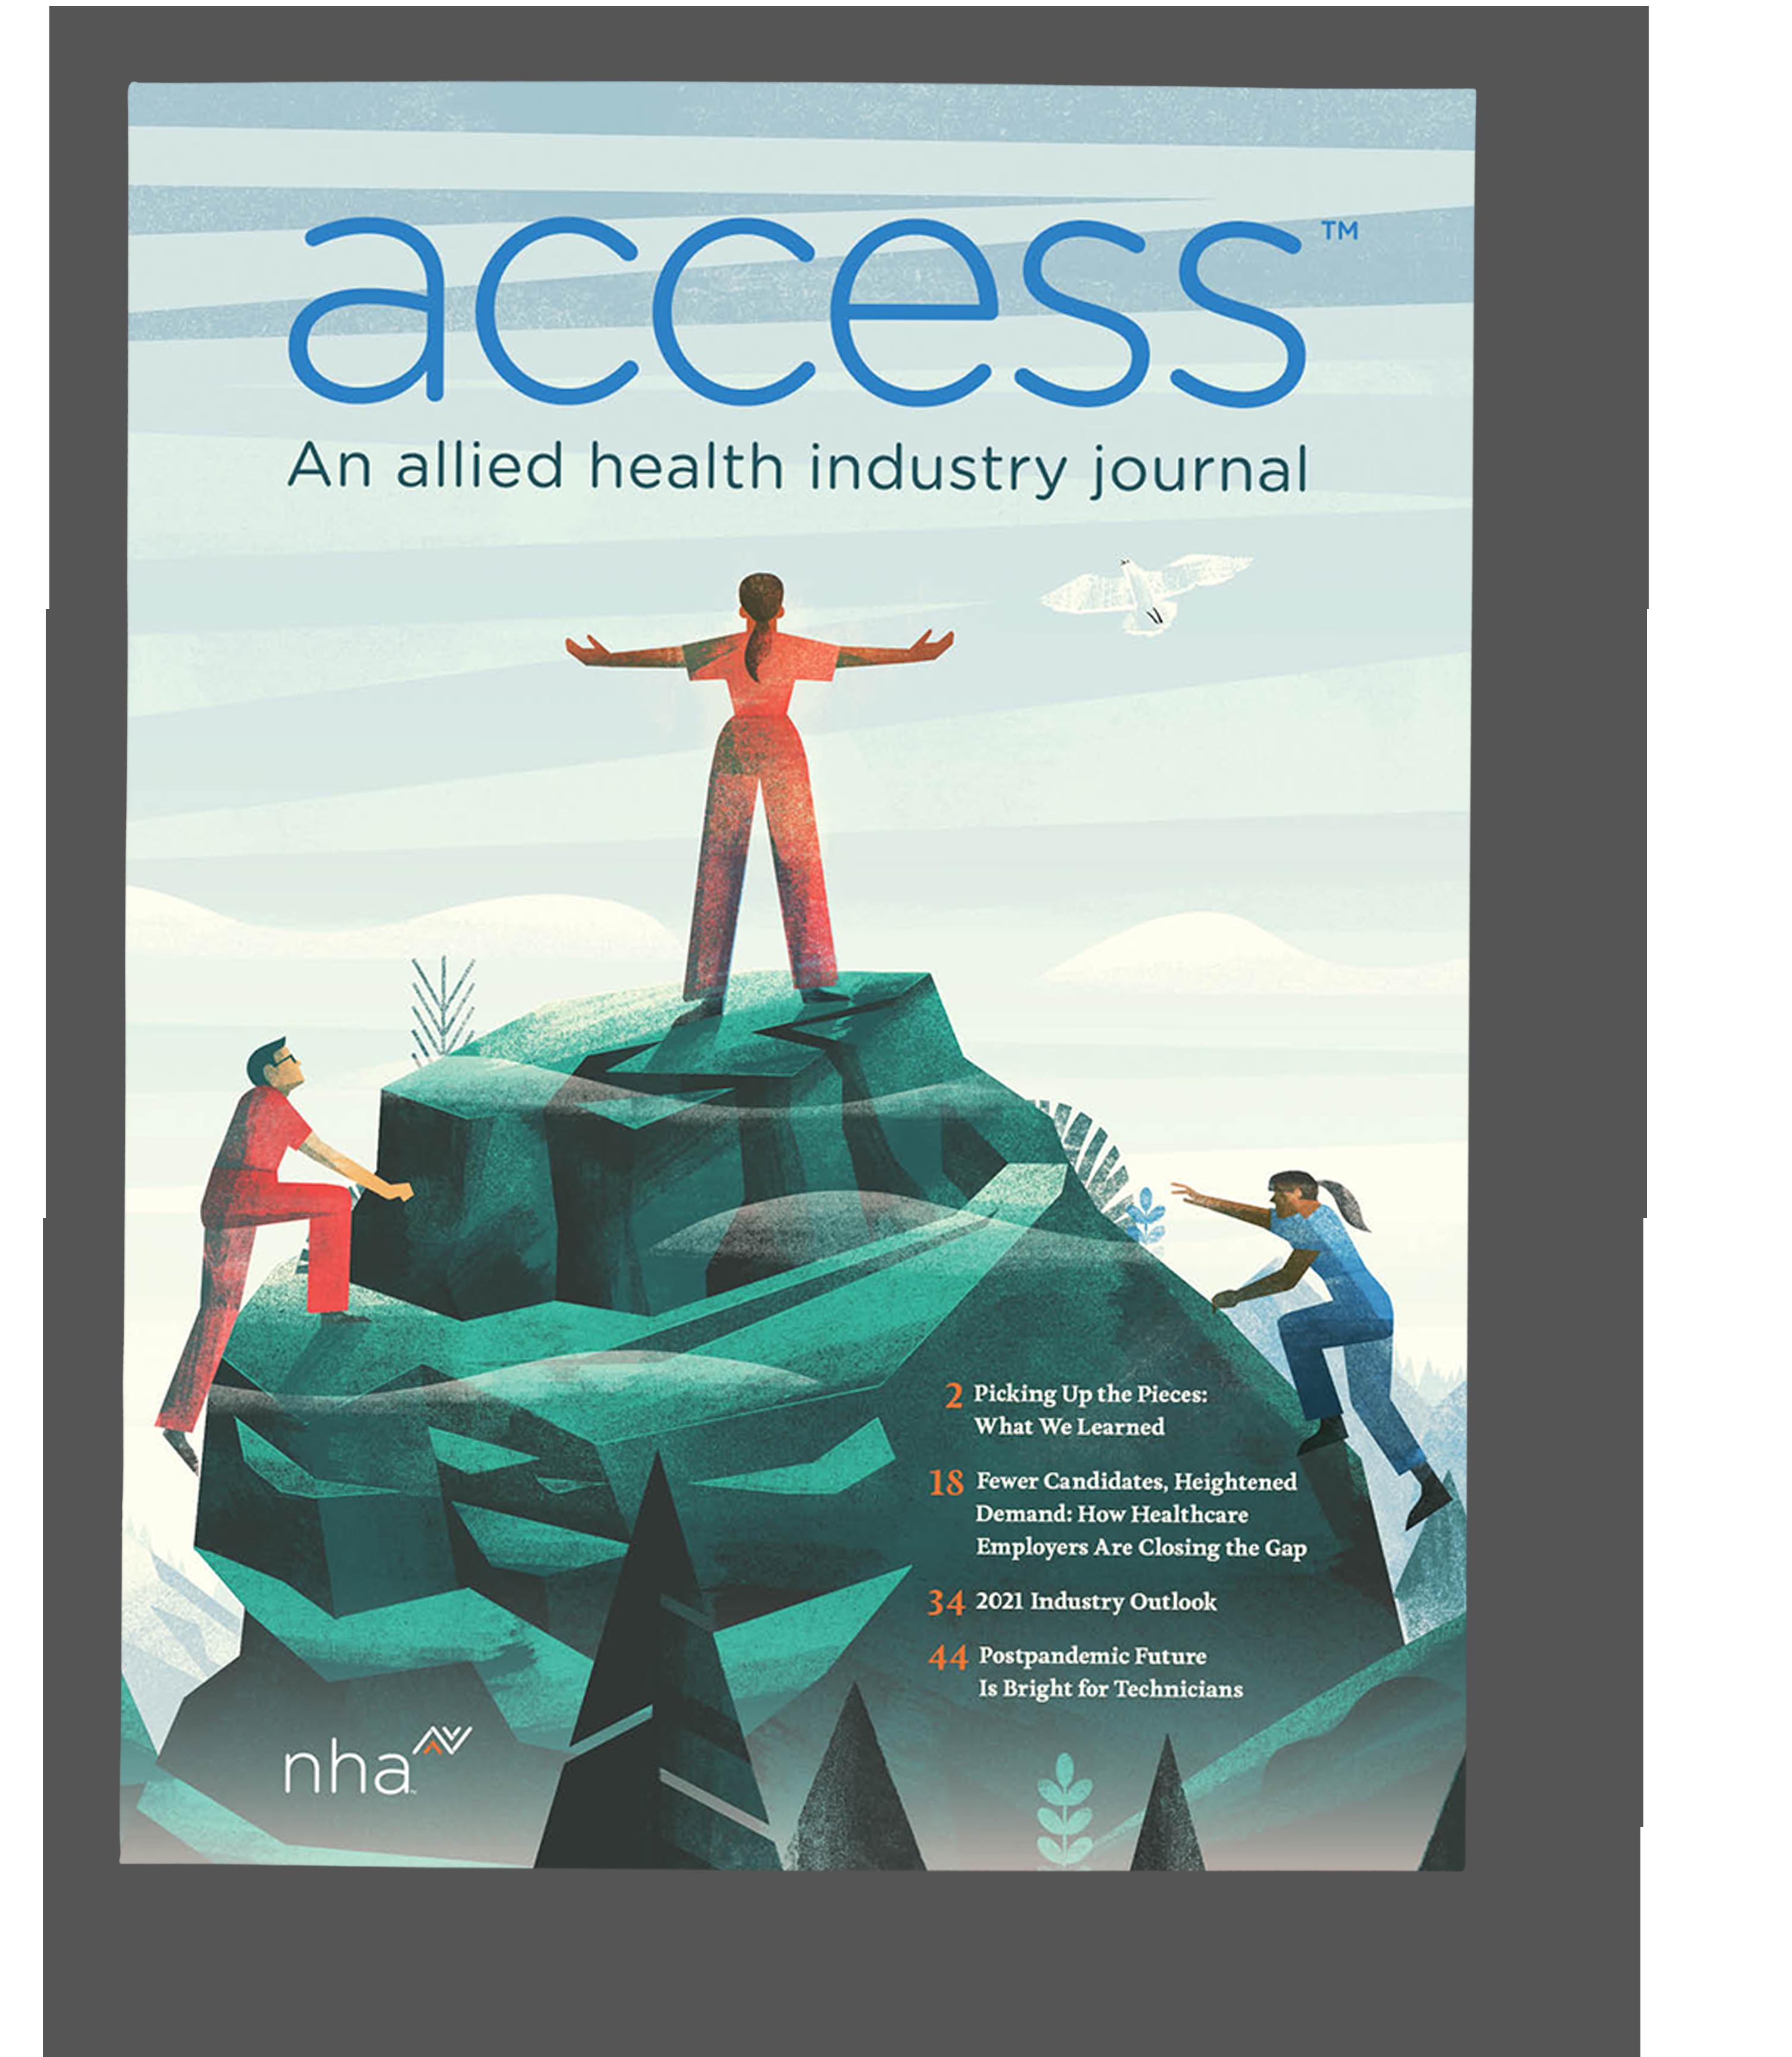 access_Cover_Mockup